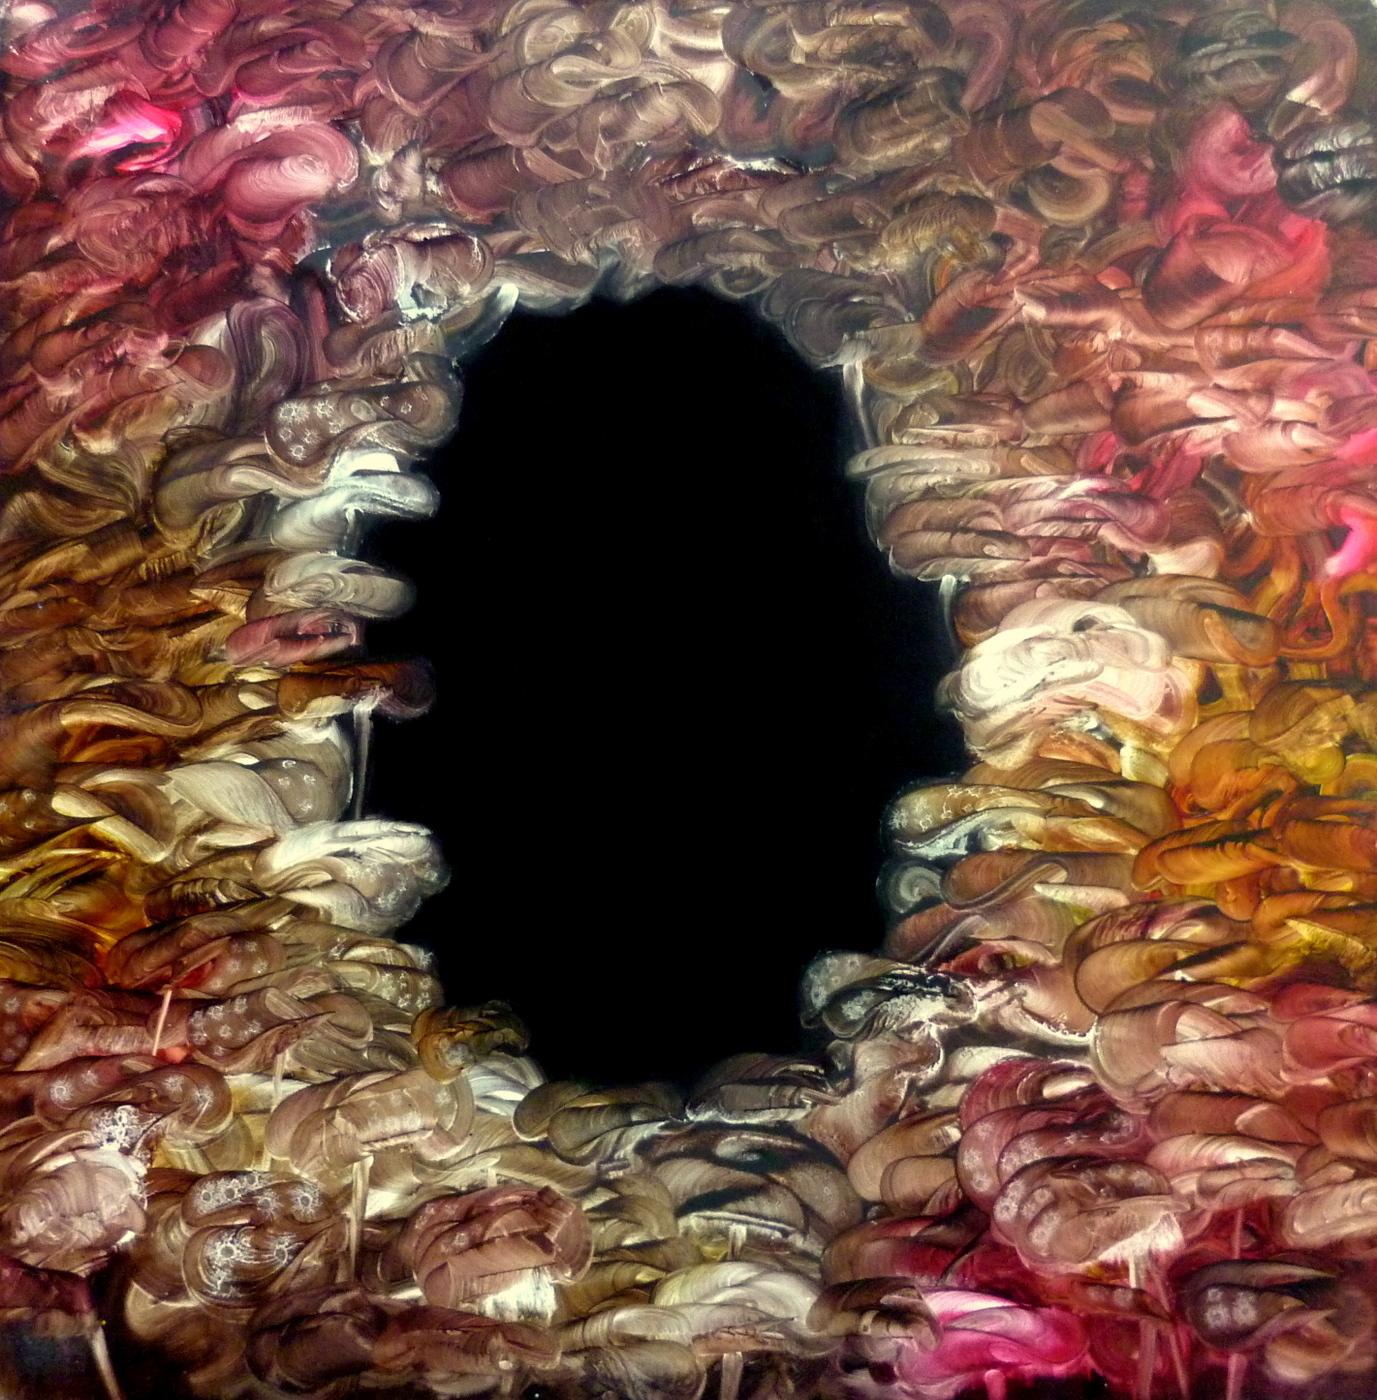 http://www.koskinen.net/wp-content/uploads/2017/04/5.EssuKoskinen_Black-Mirror-2016.jpg